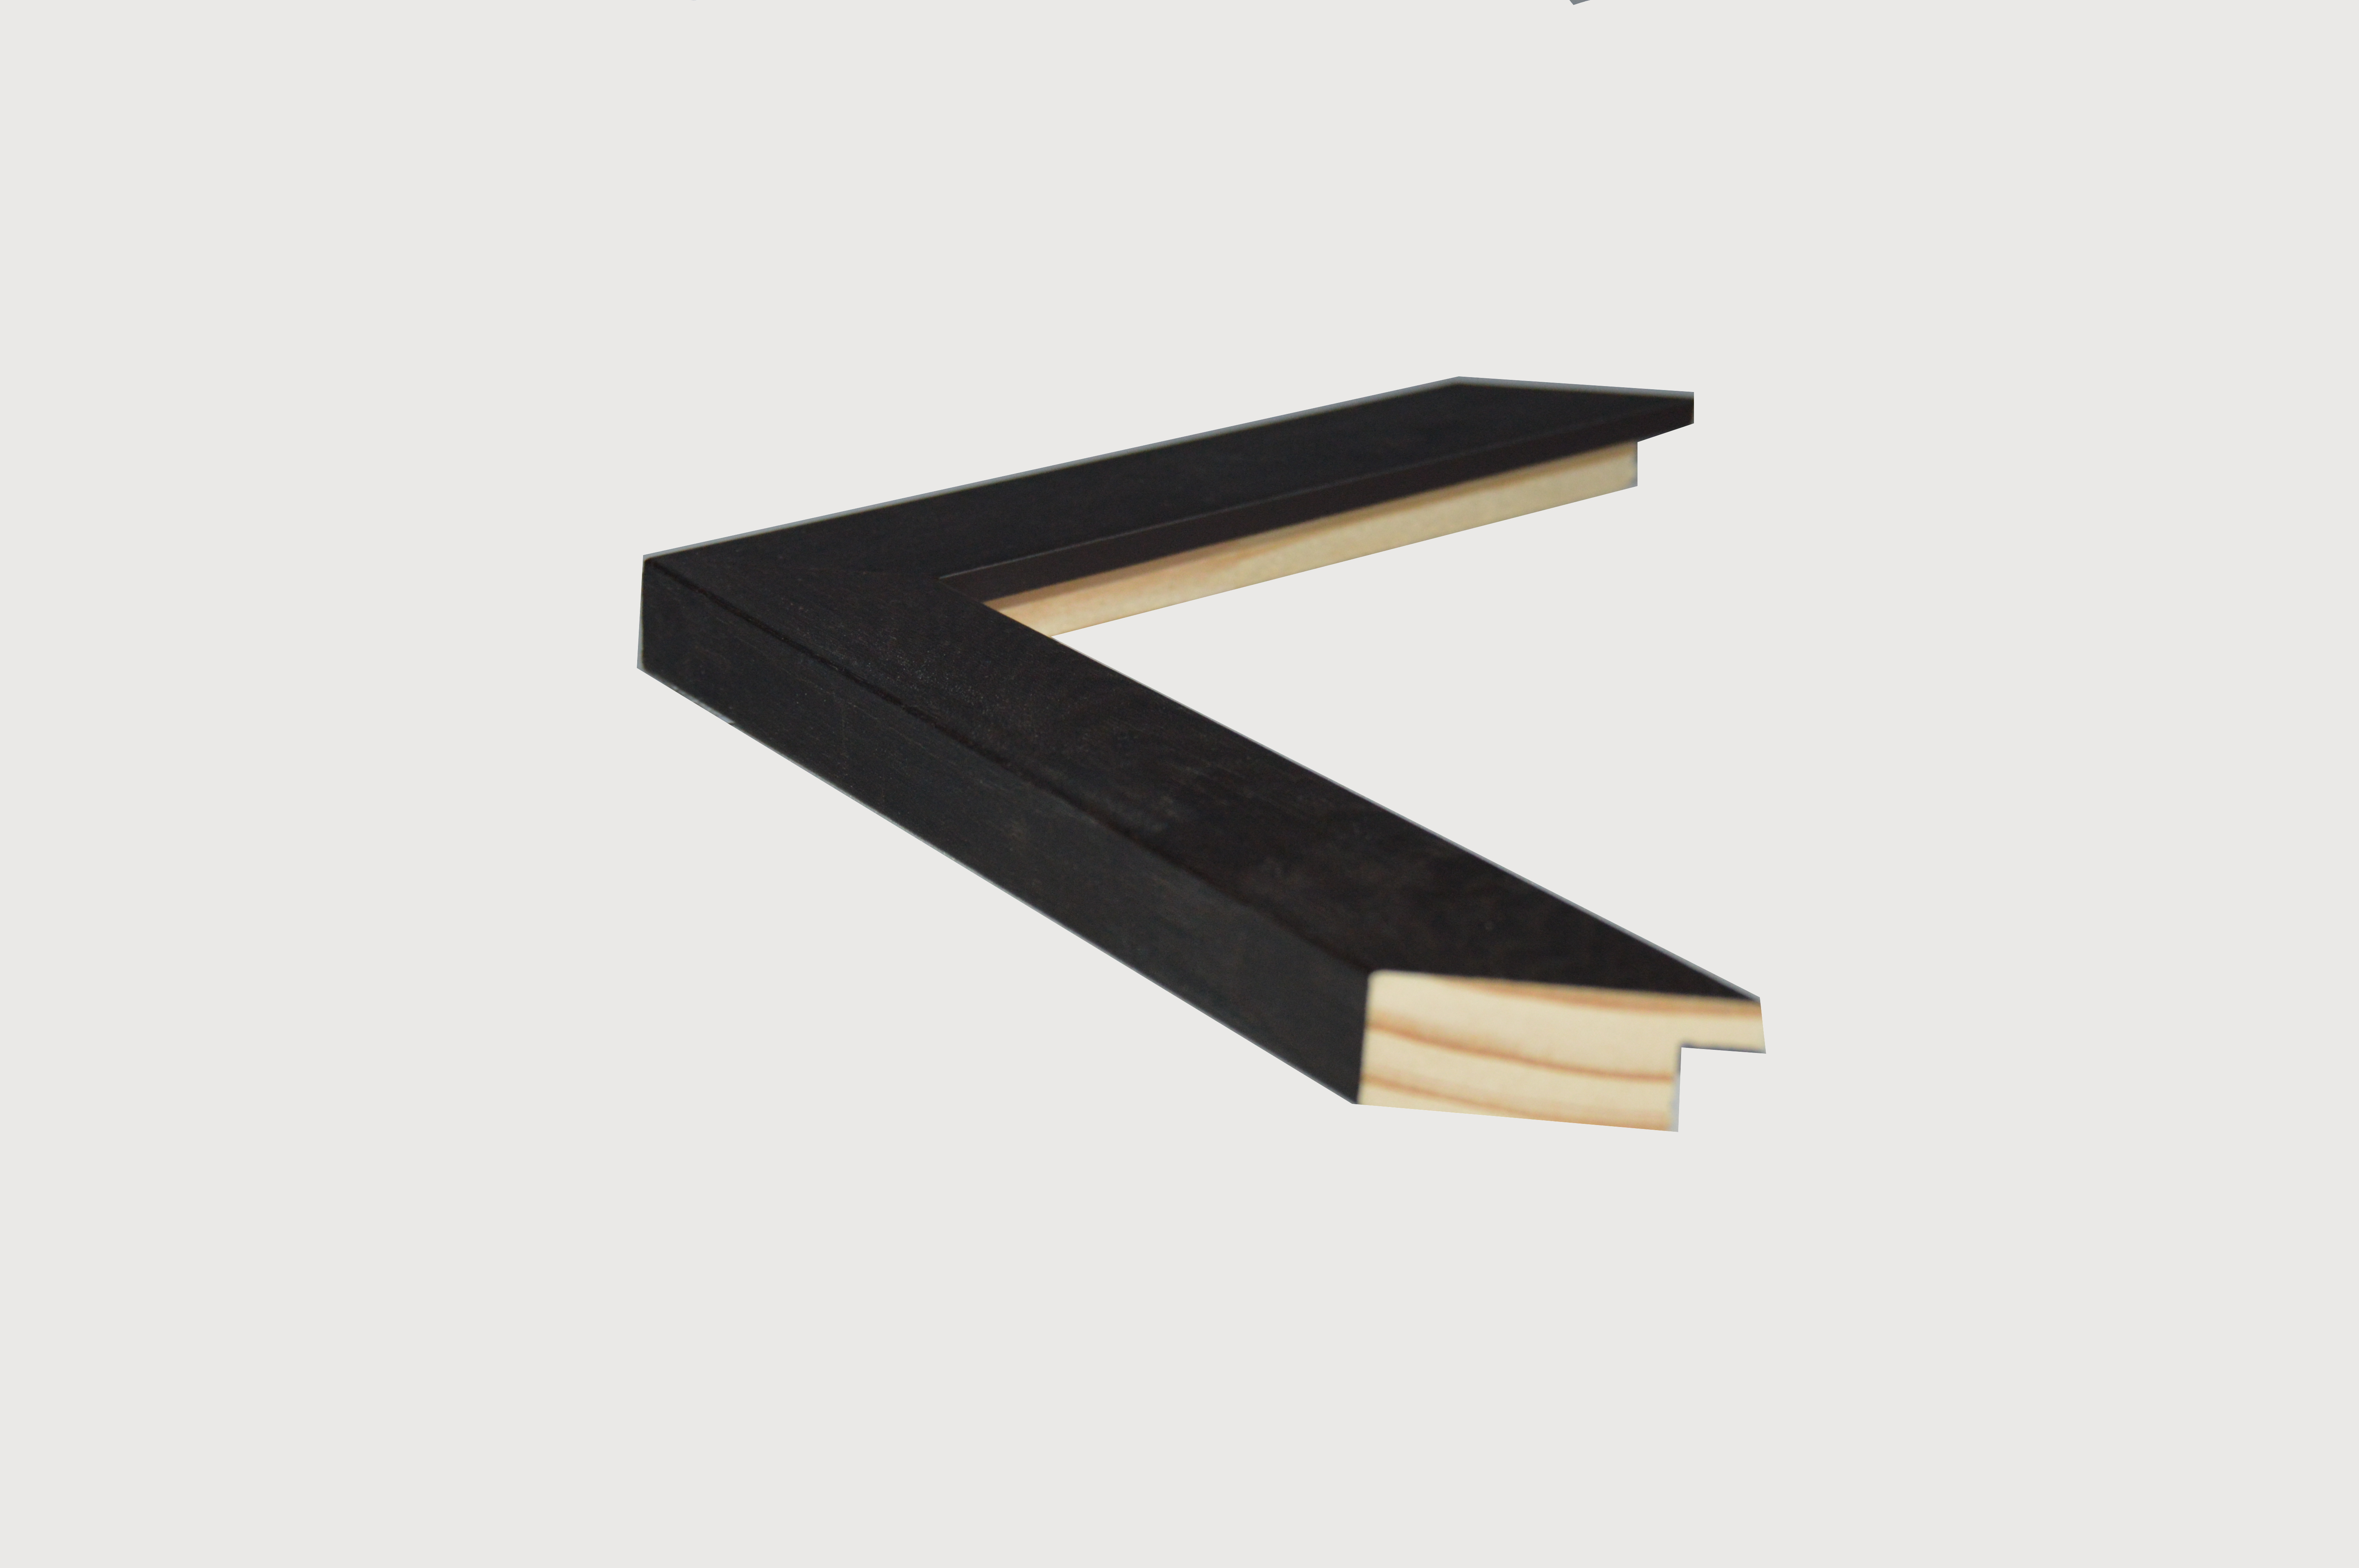 02816-548-WENGUE-ancho2,8cm-perfil